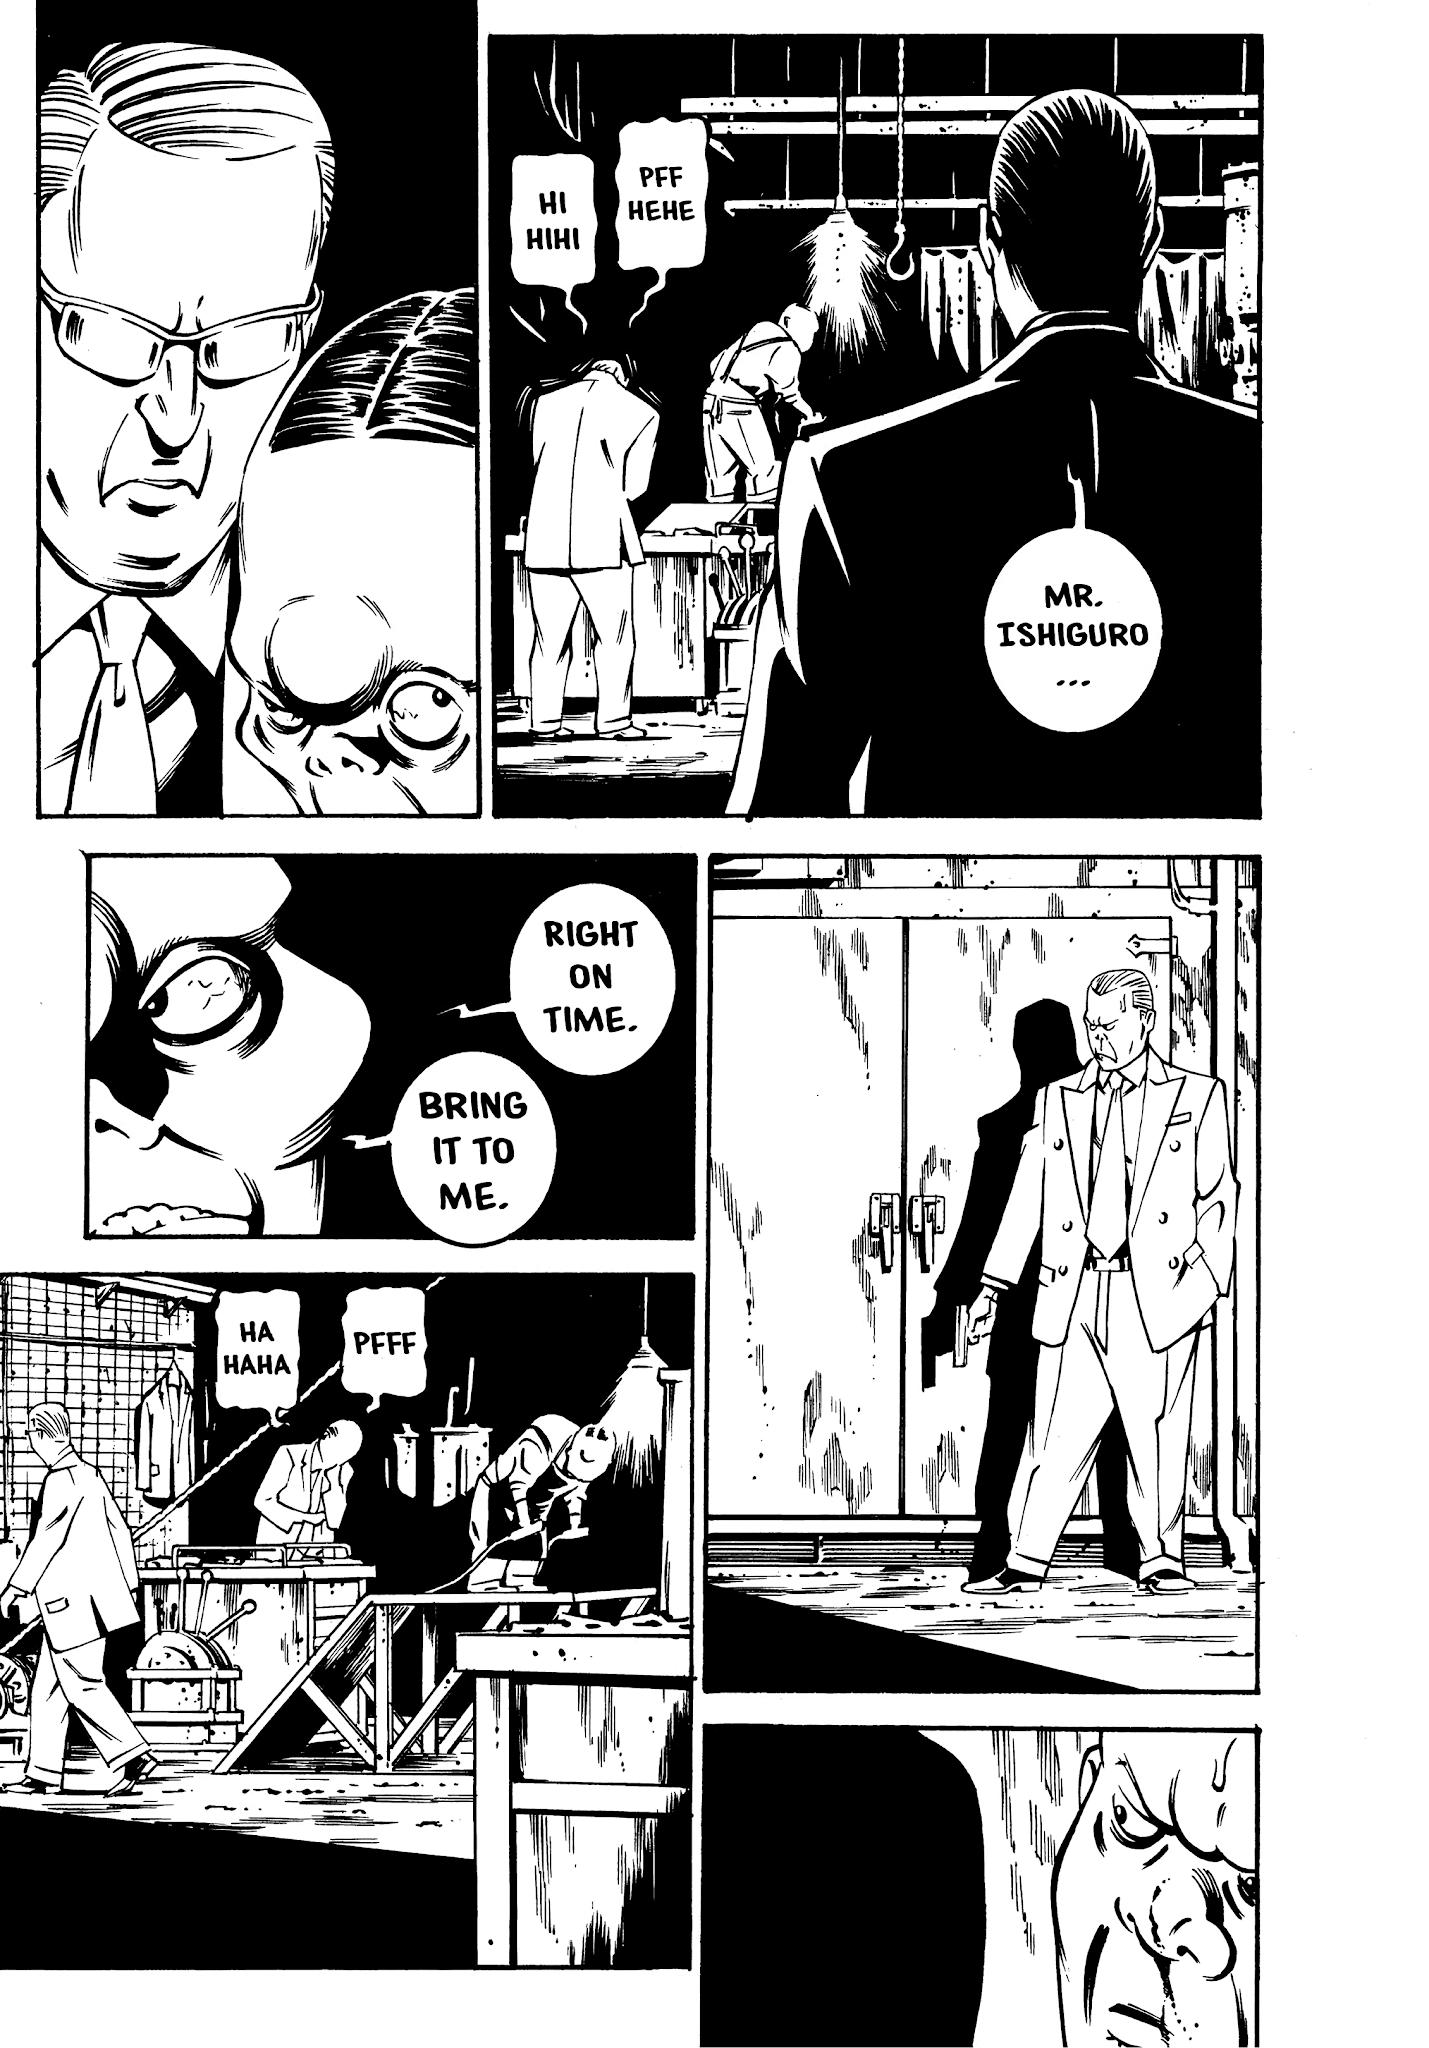 Deathco Chapter 13: The Playground (3) page 13 - Mangakakalots.com